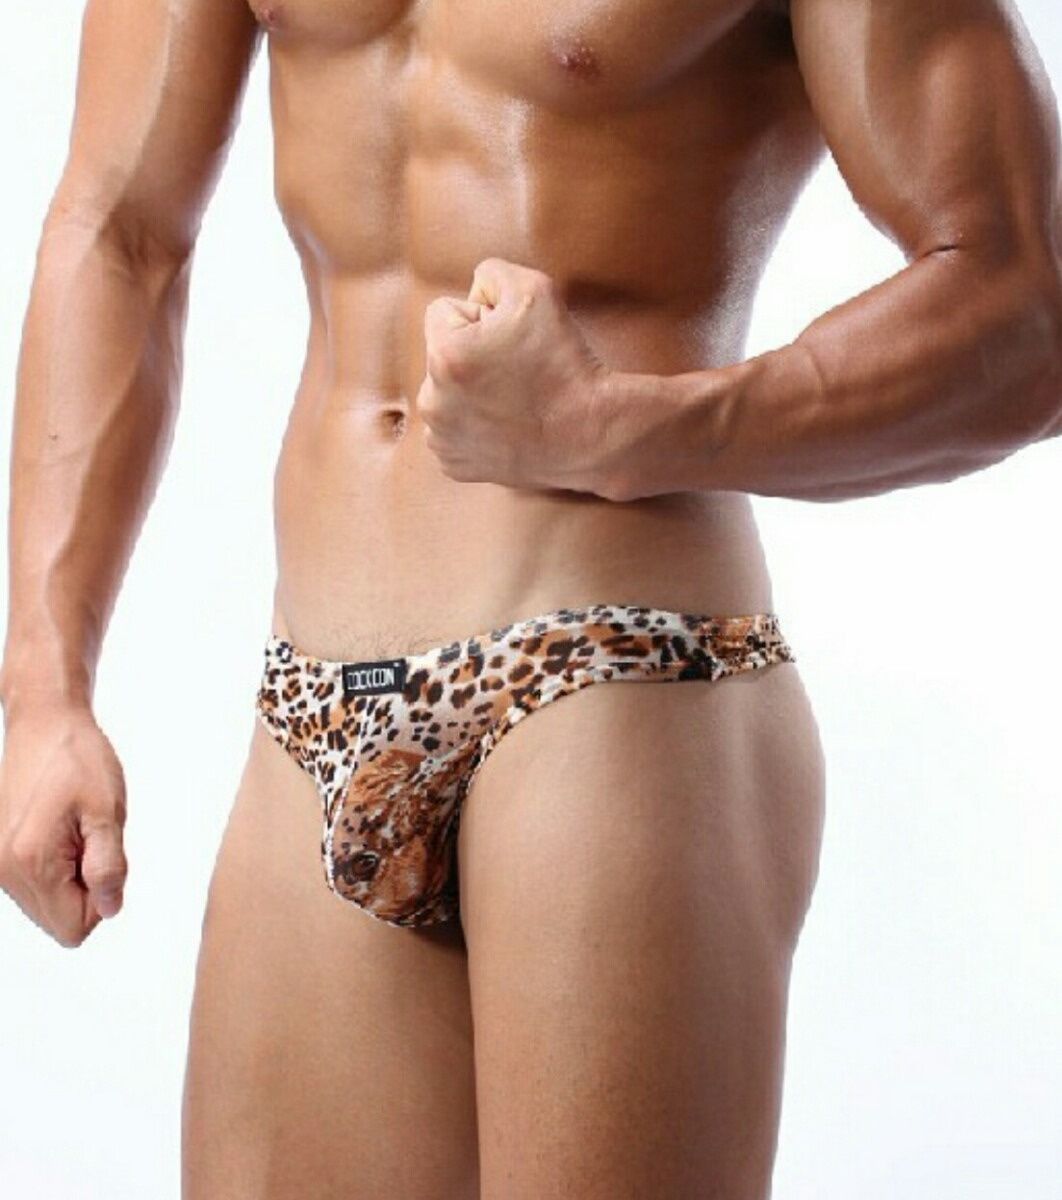 Lenceria boxer ropa interior hombre animal print - Ropa interior hombre transparente ...